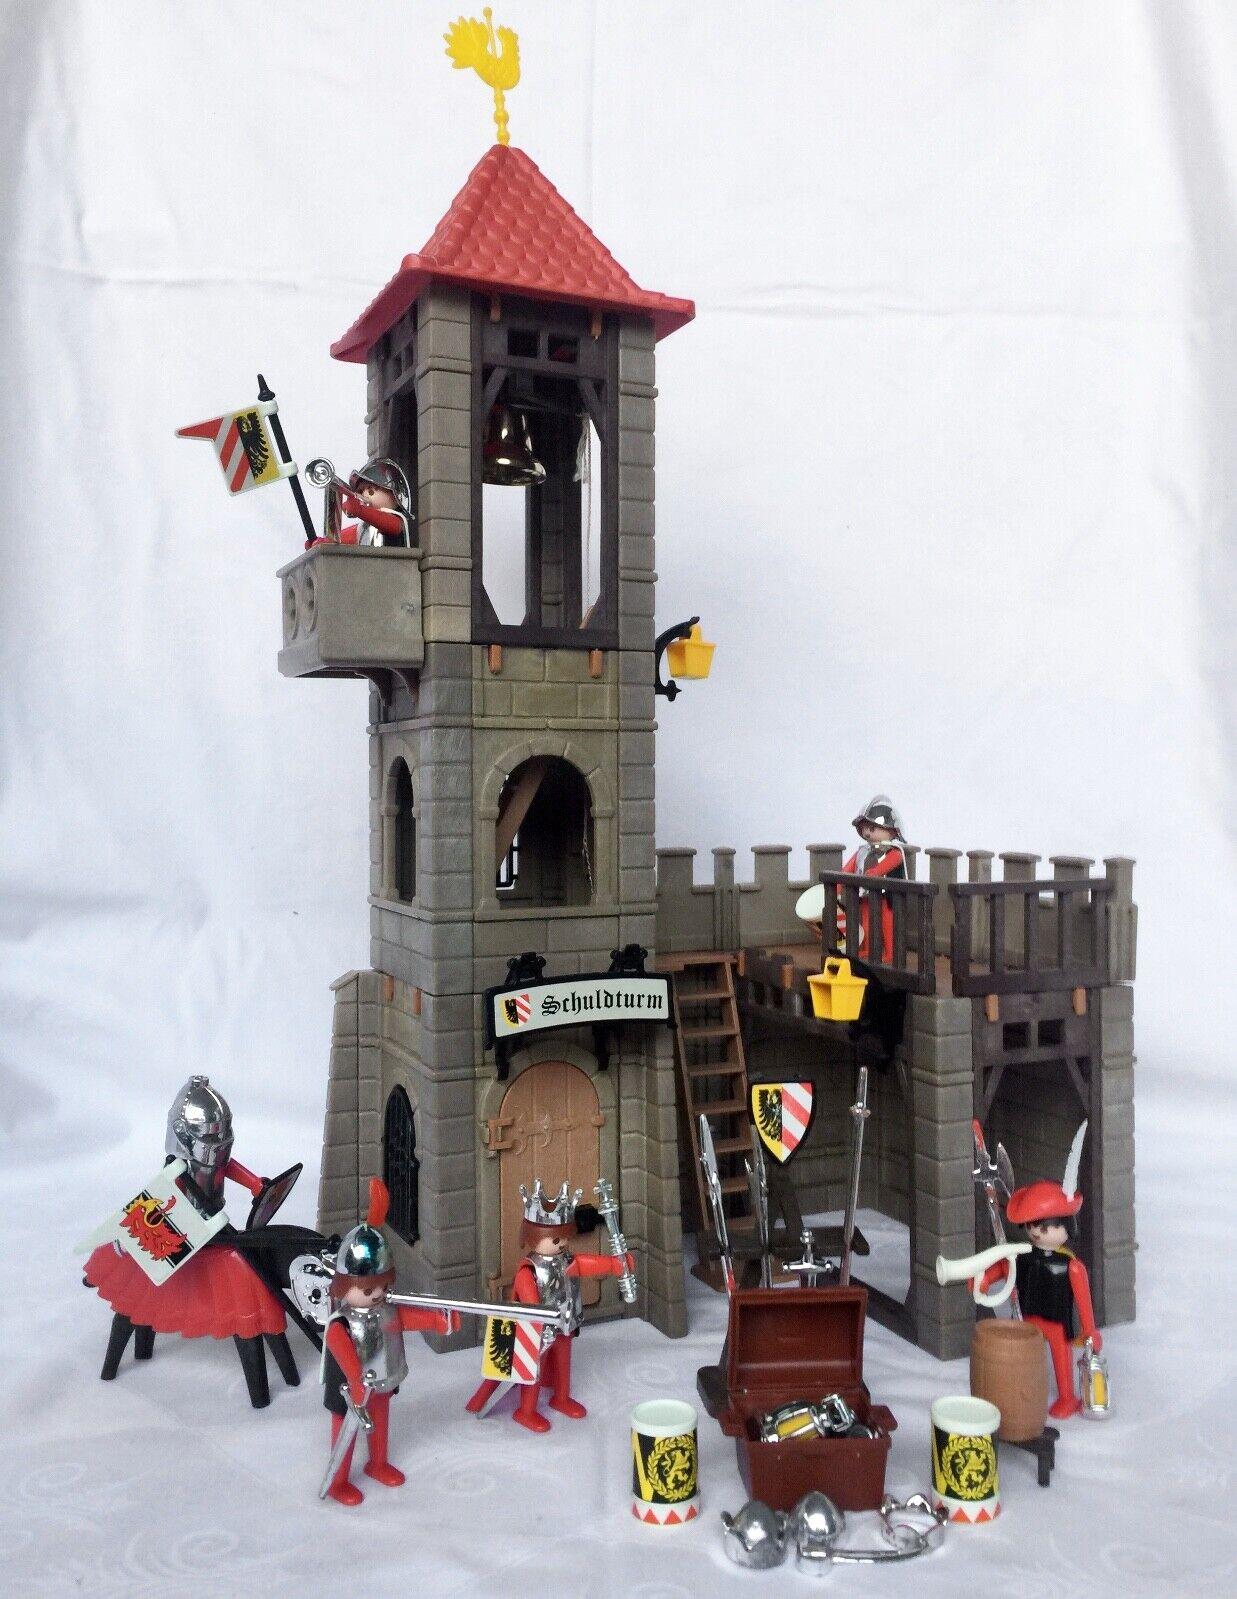 Playmobil 3445 Schuldturm + Zubehör Ritter Burg Mittelalter